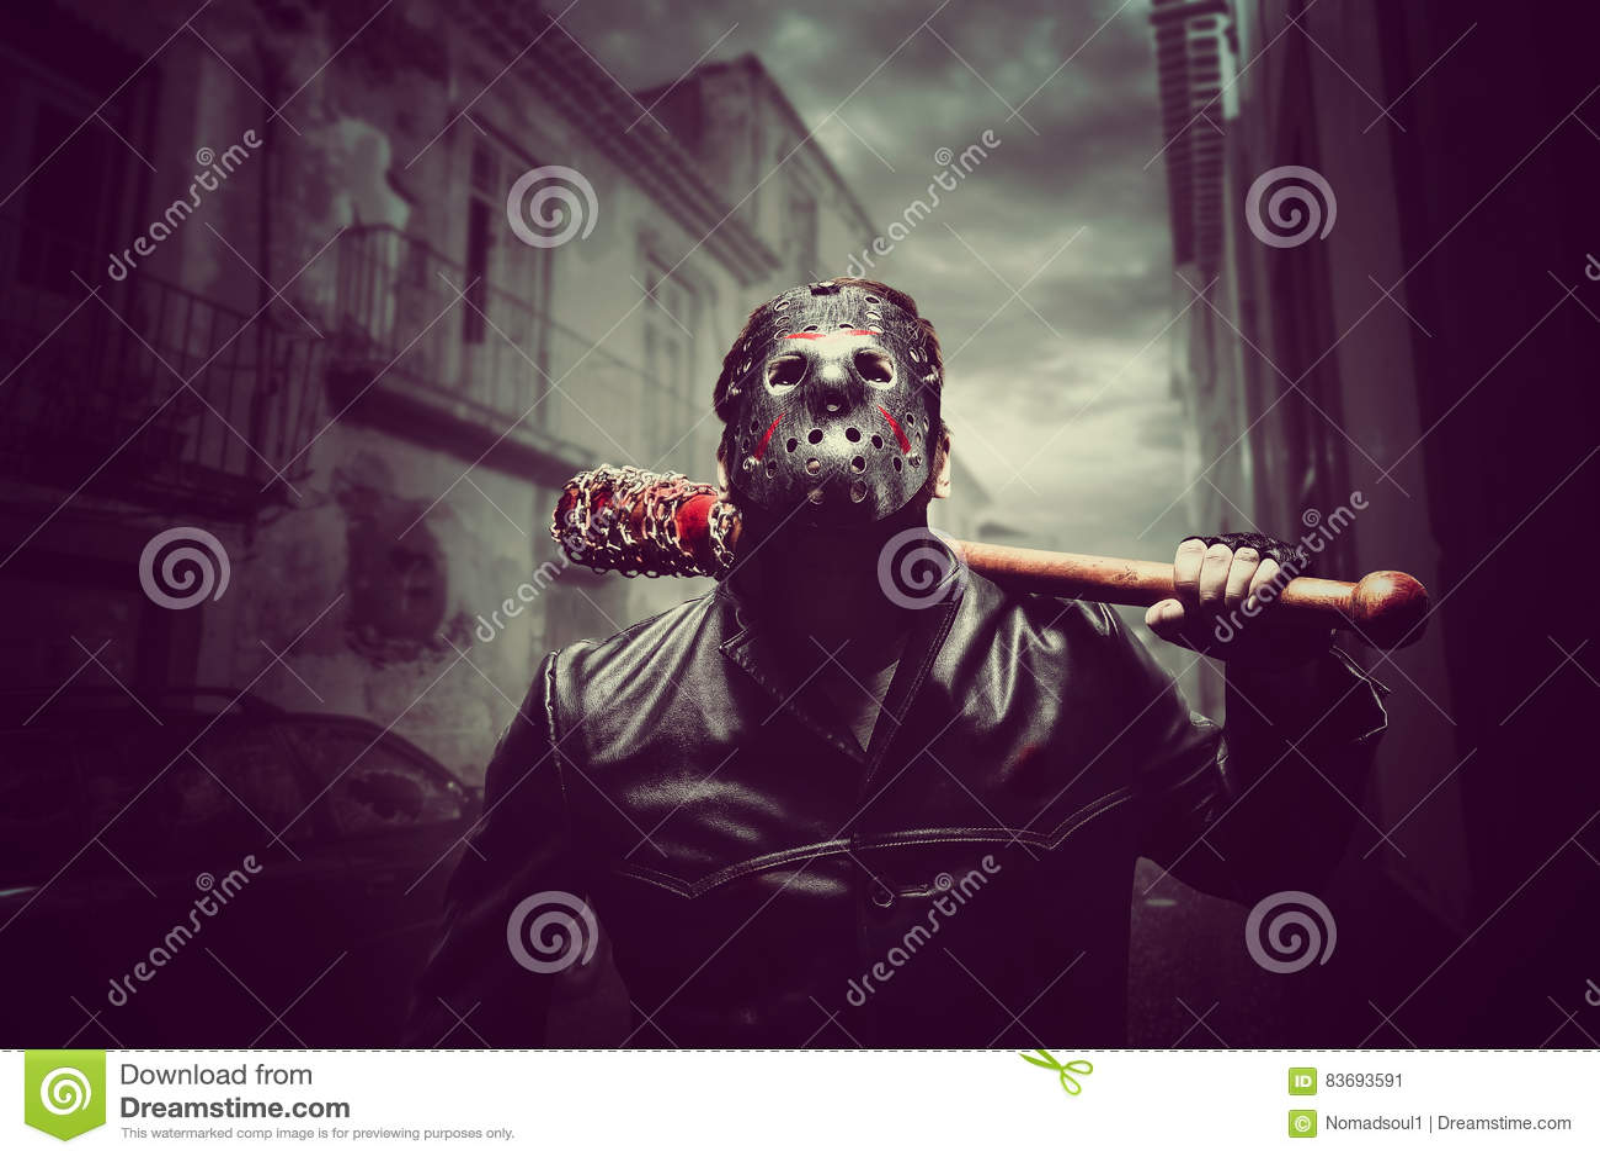 Psycho man in hockey mask with bloody baseball bat